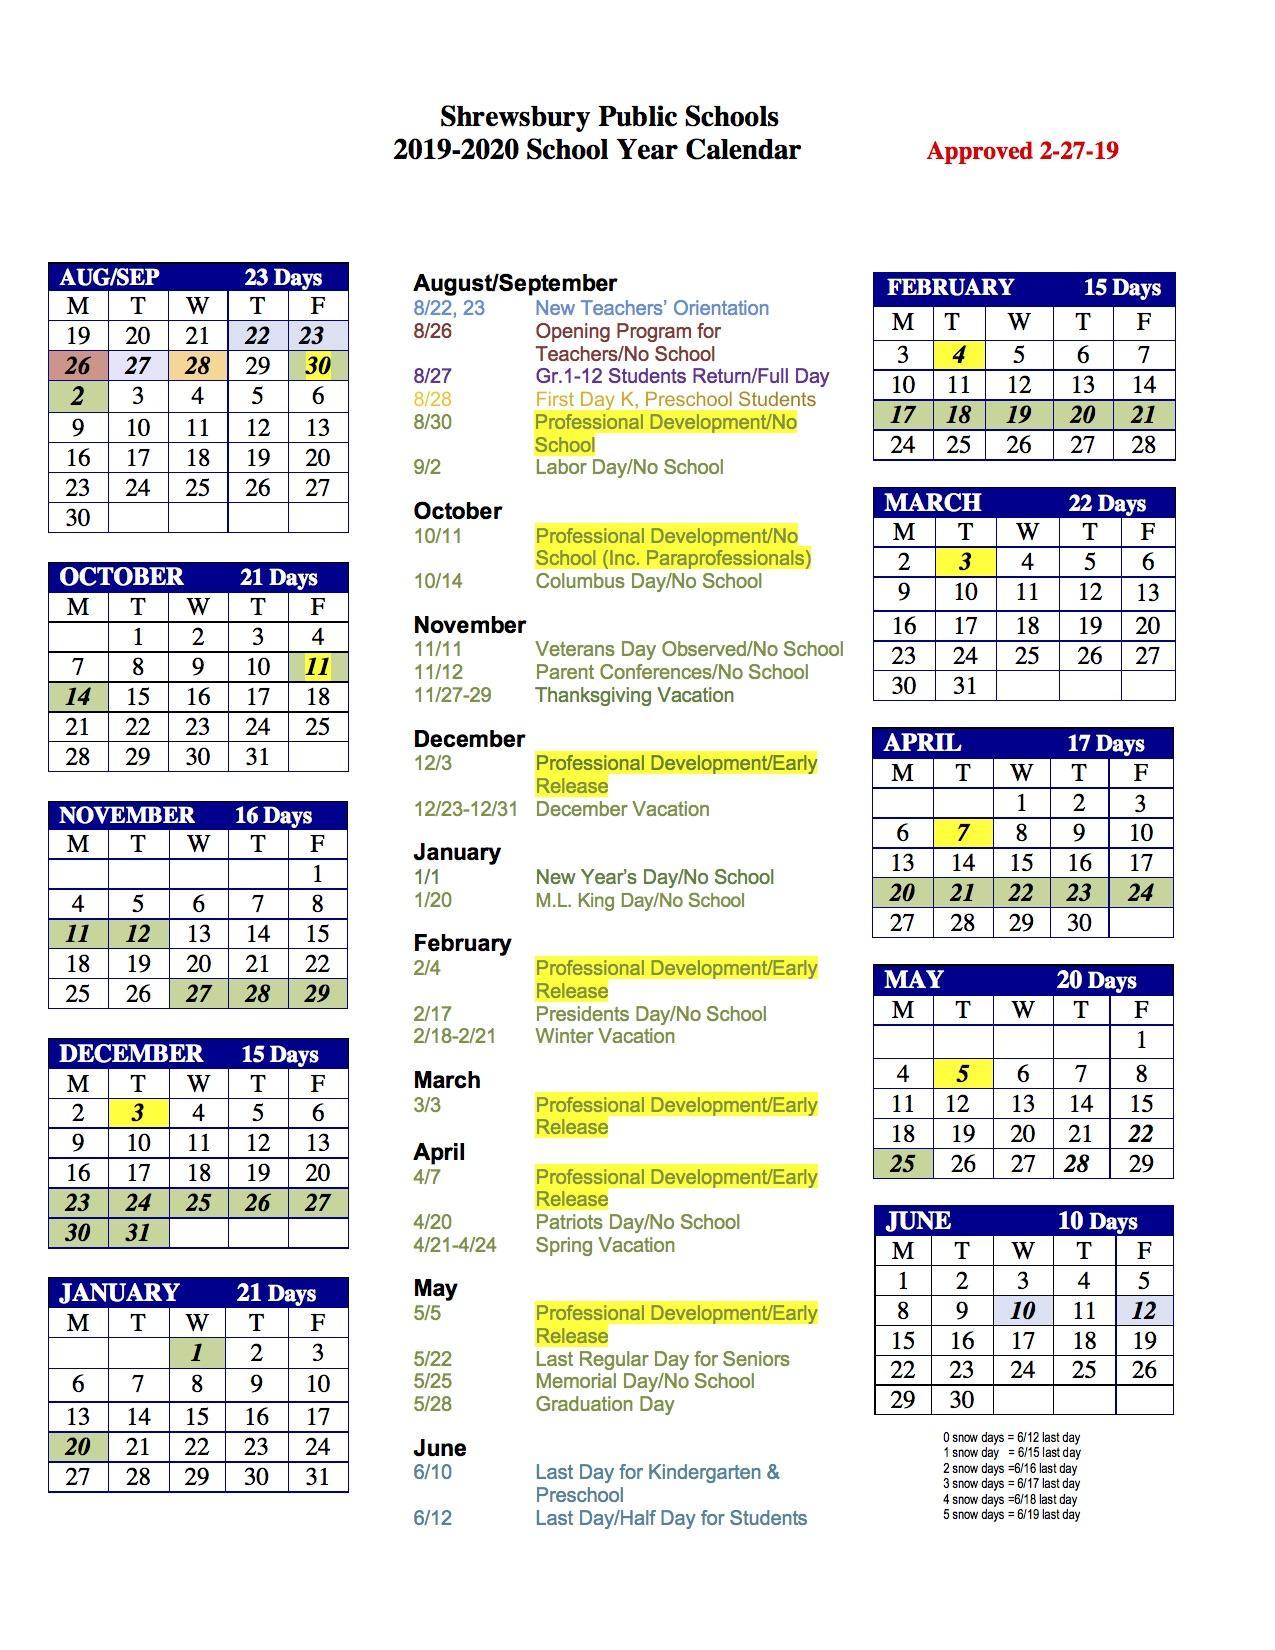 Images of Westborough School Calendar 2021